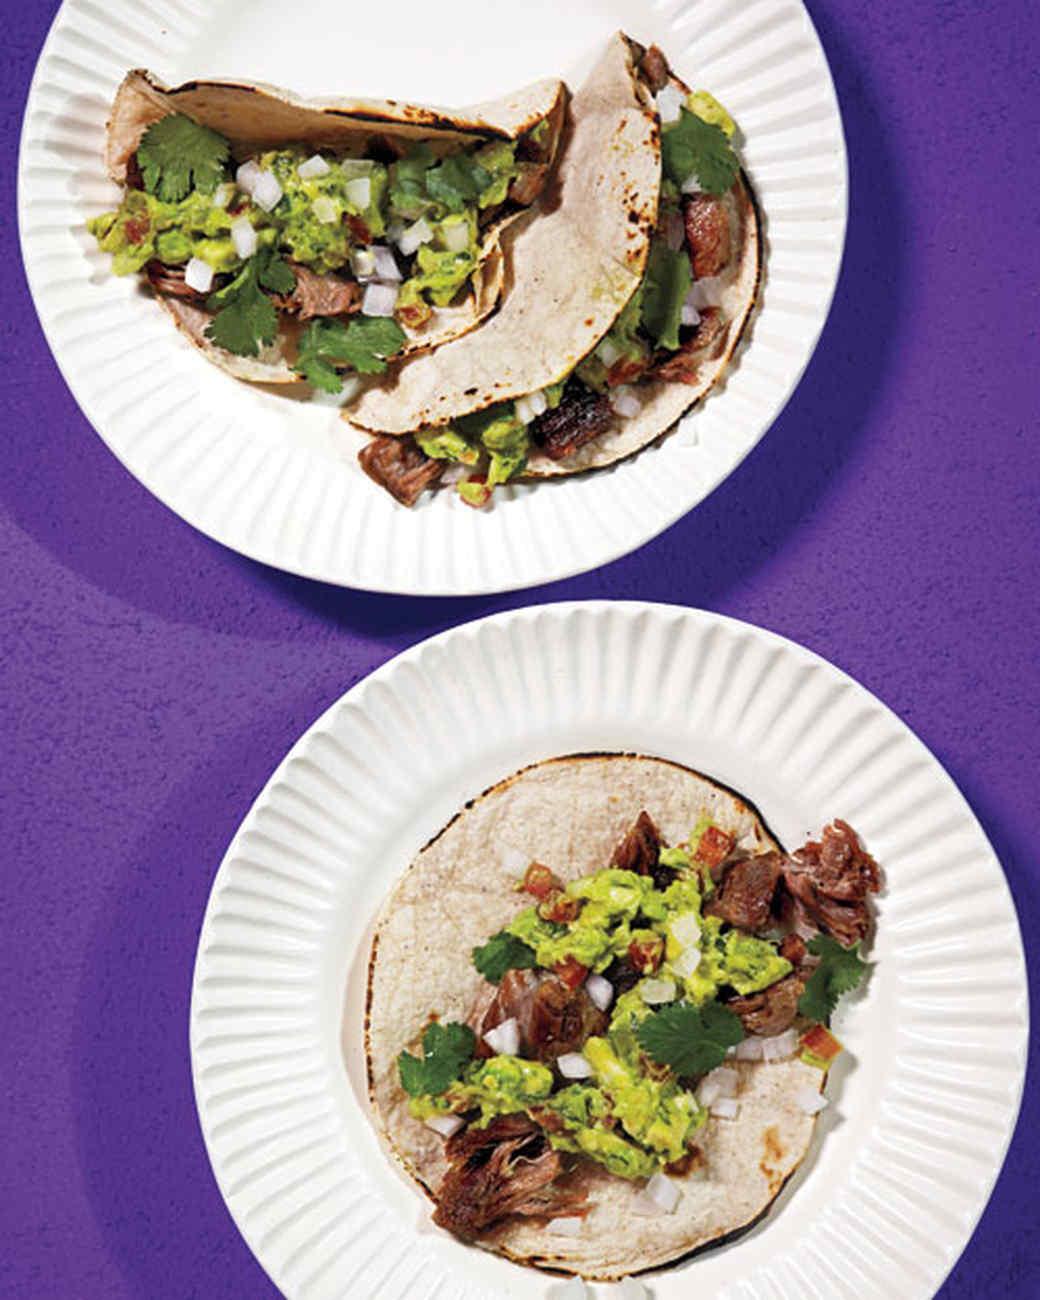 pork-carnitas-0611med107092tac.jpg